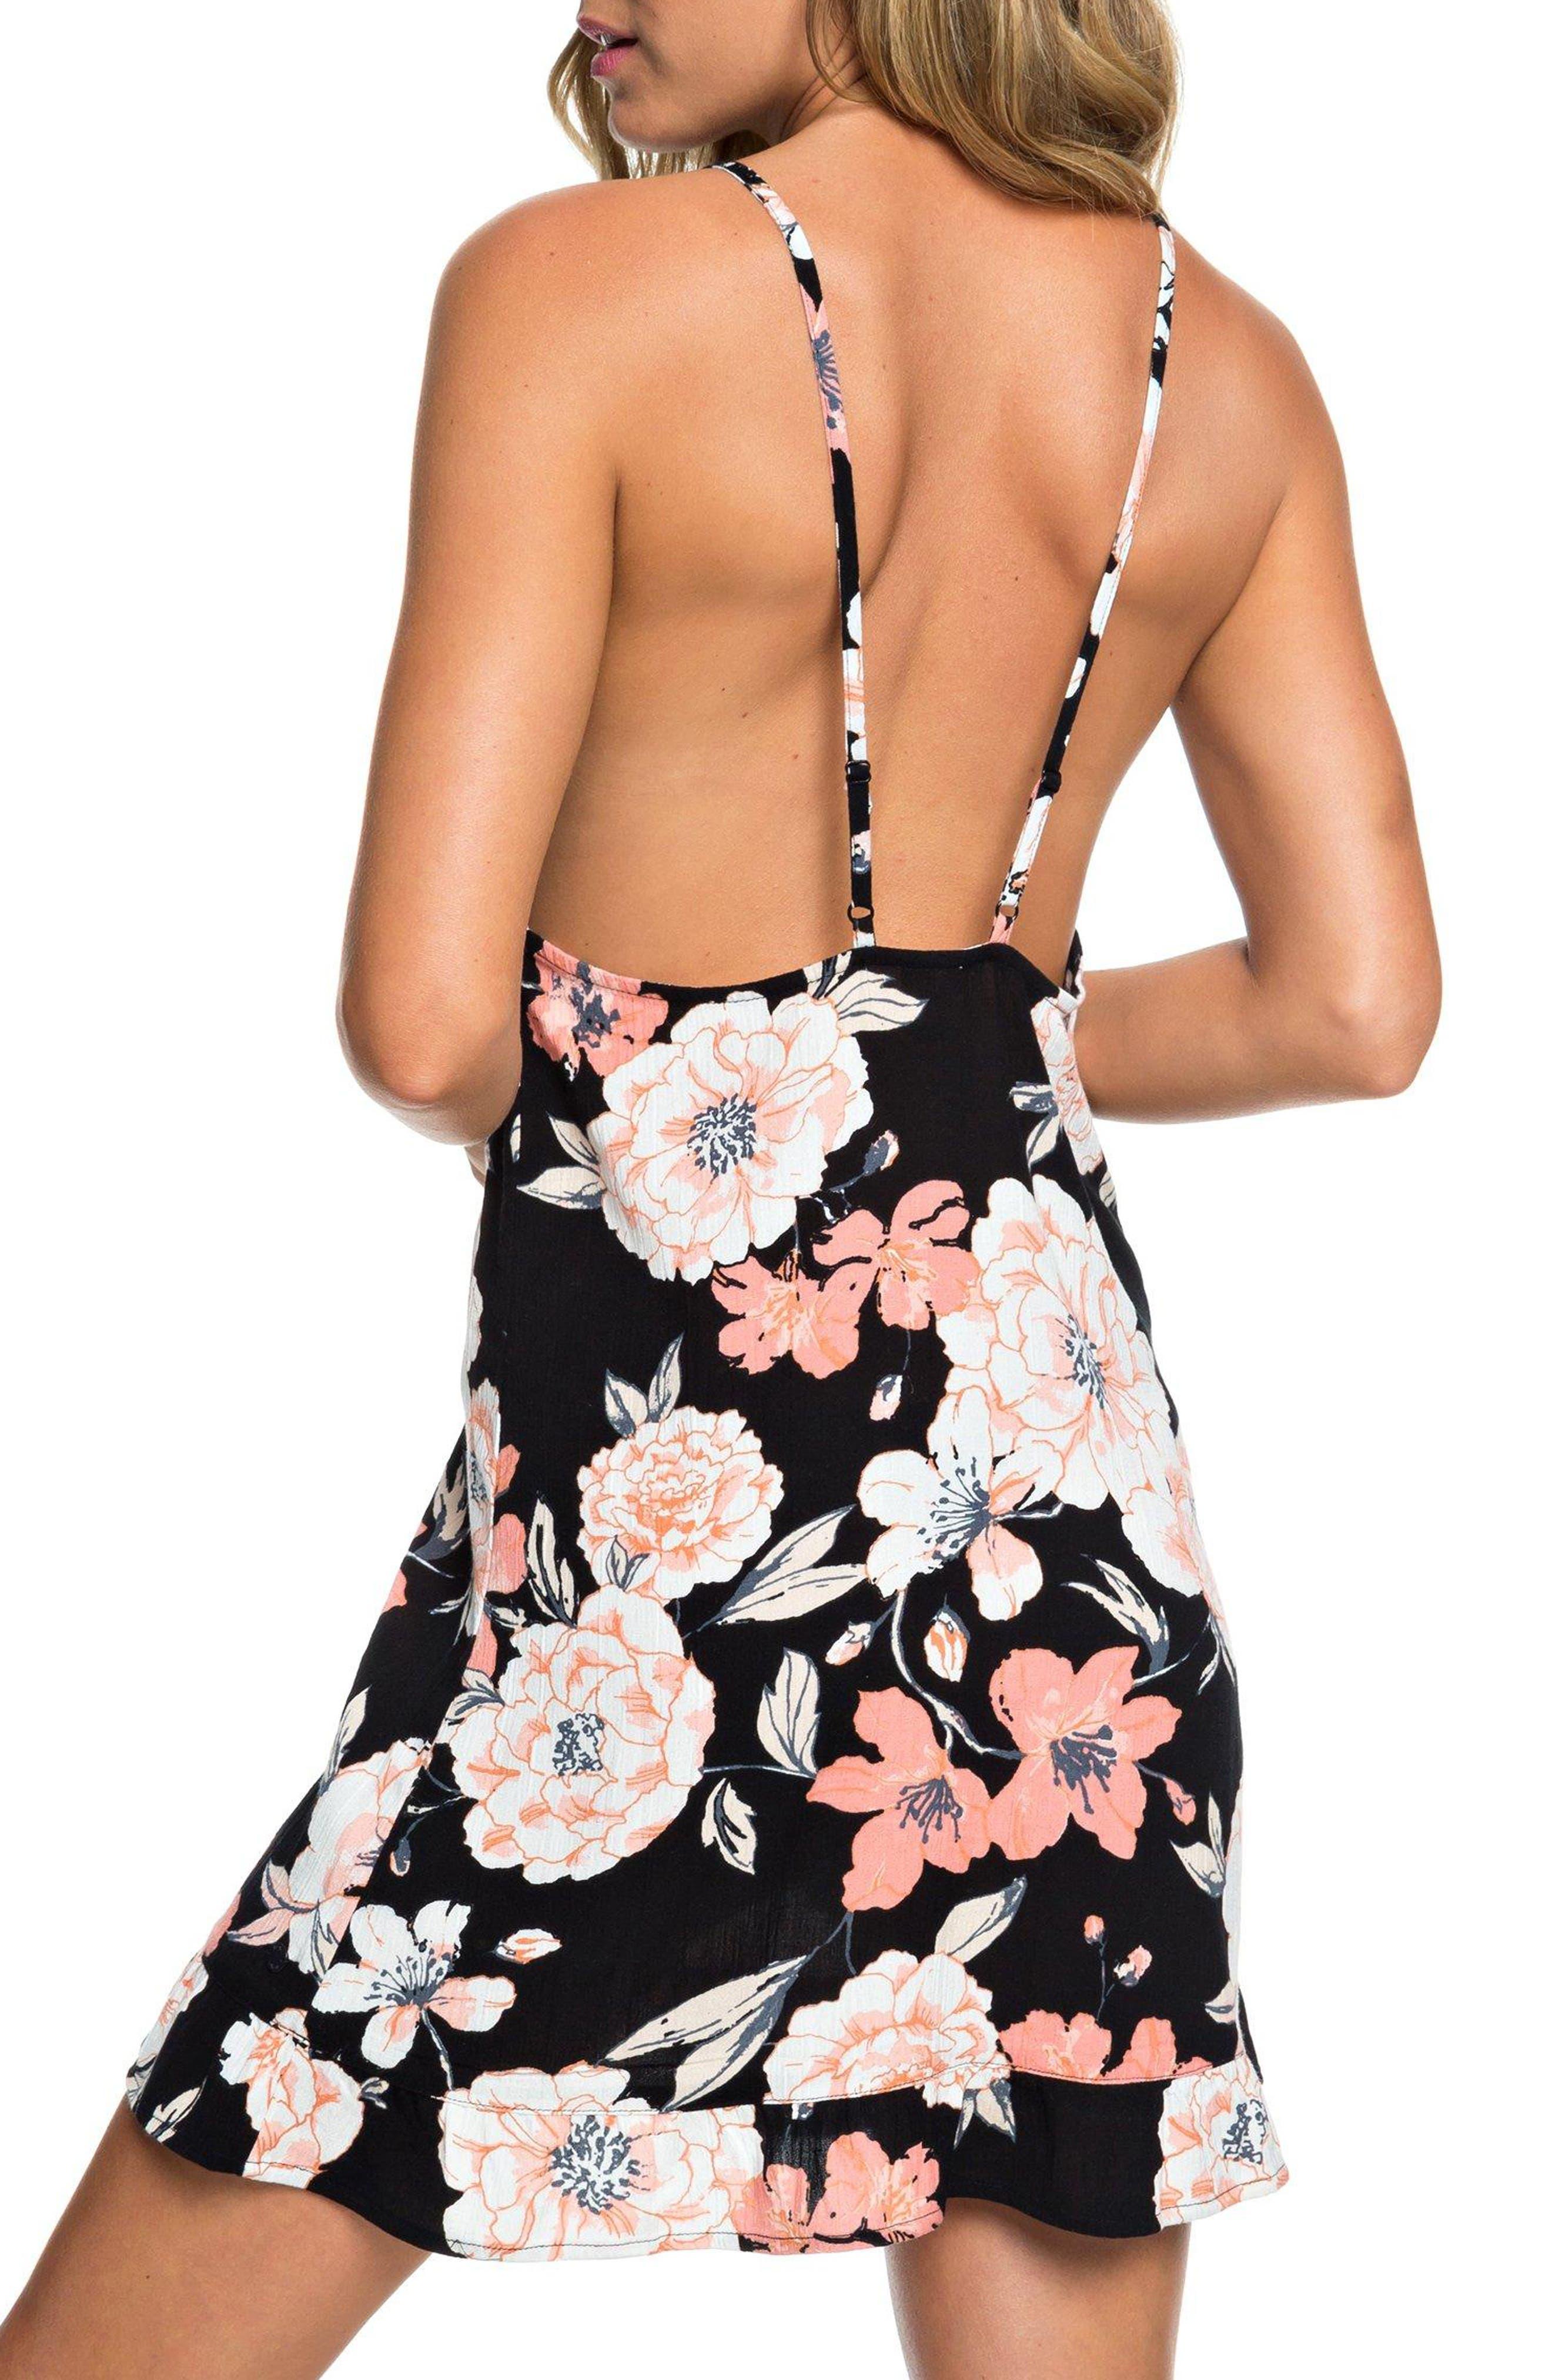 Roxy Dresses Golden Skin Floral Print Minidress